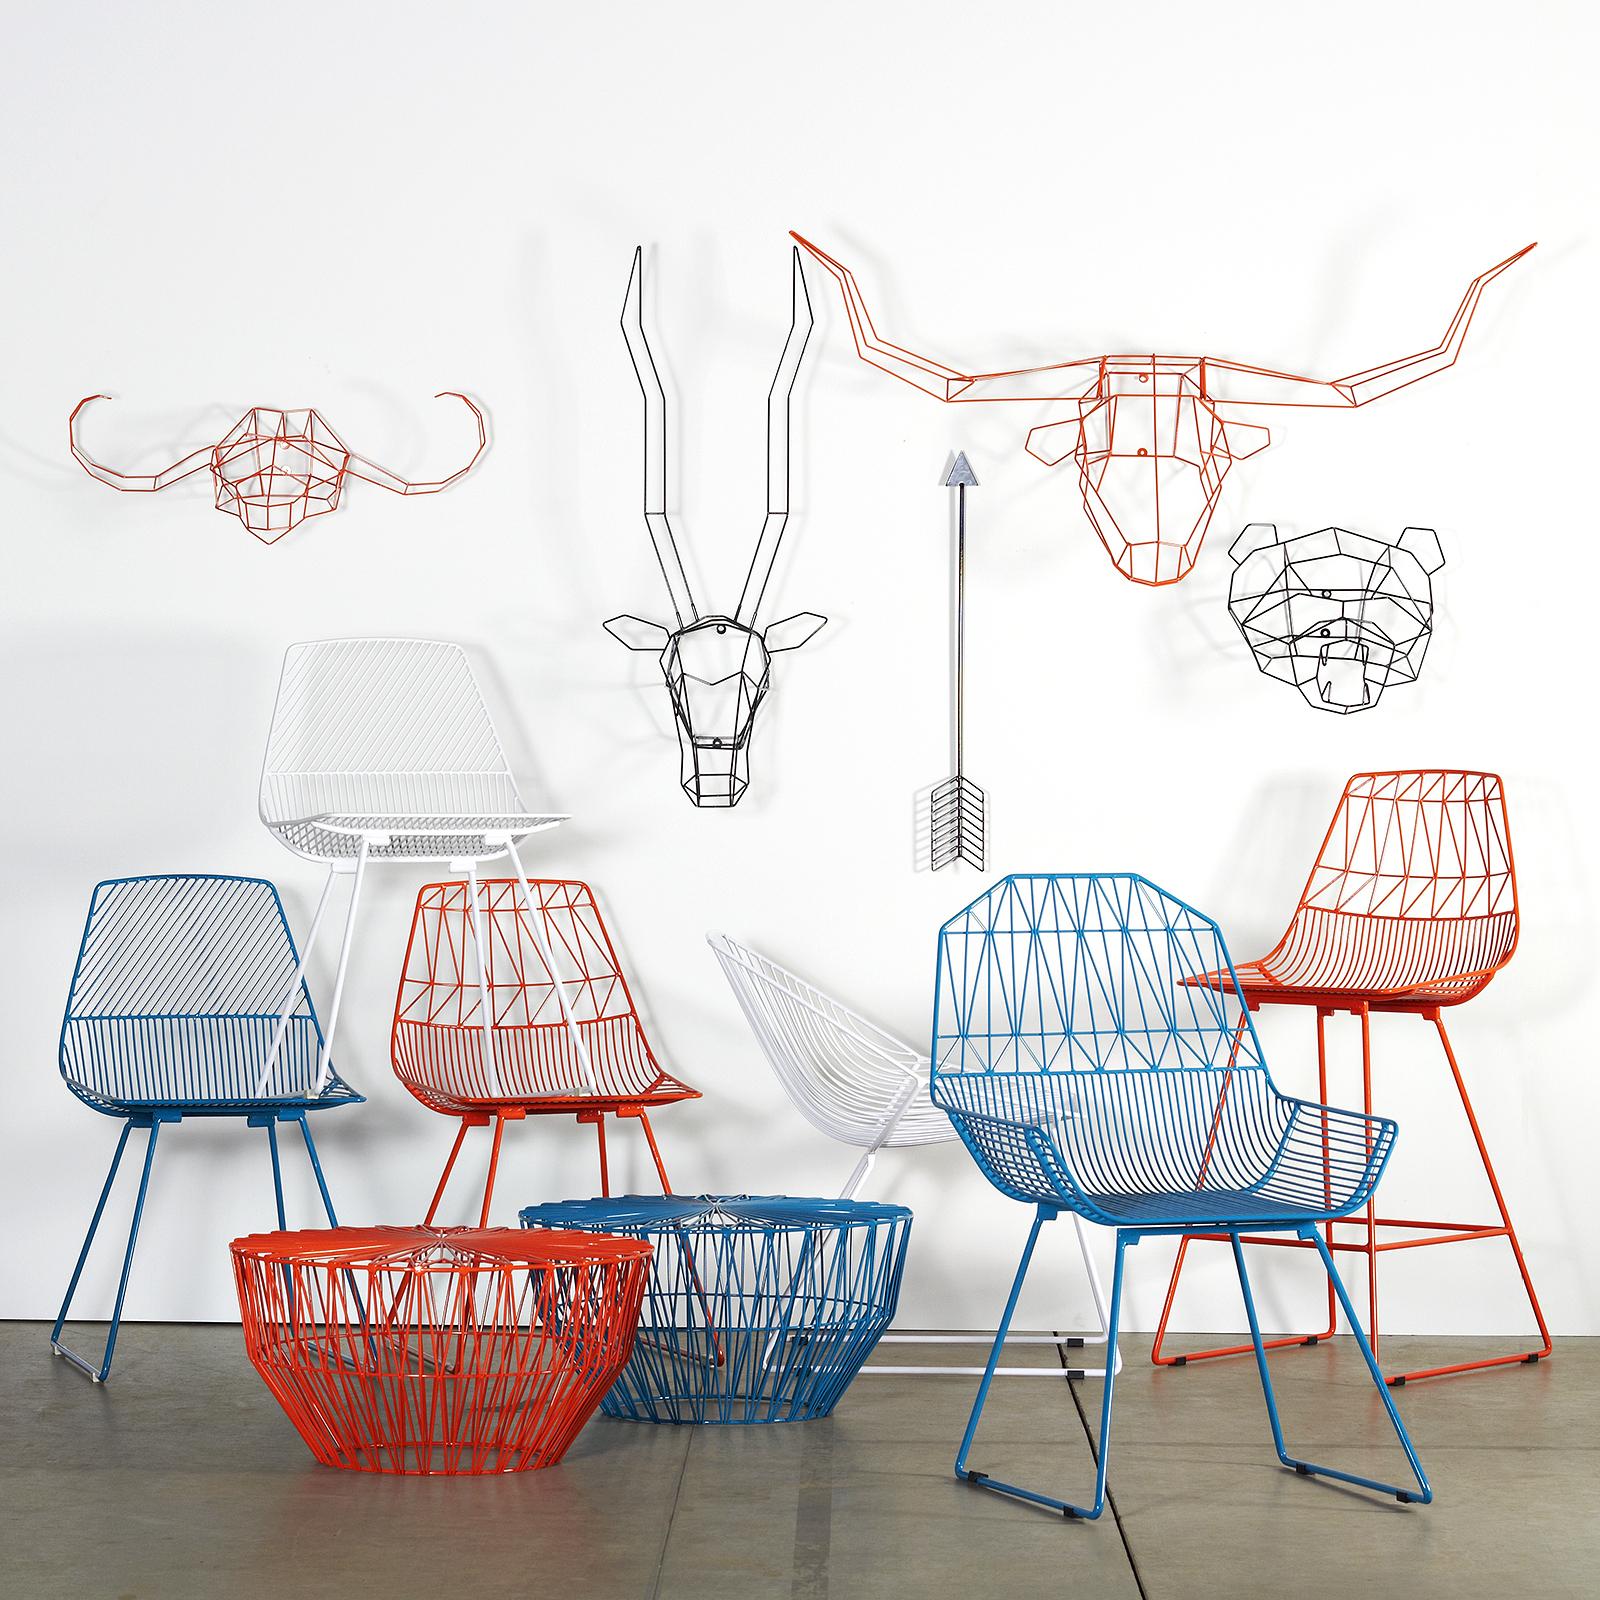 west bend furniture and design. Bend West Furniture And Design O